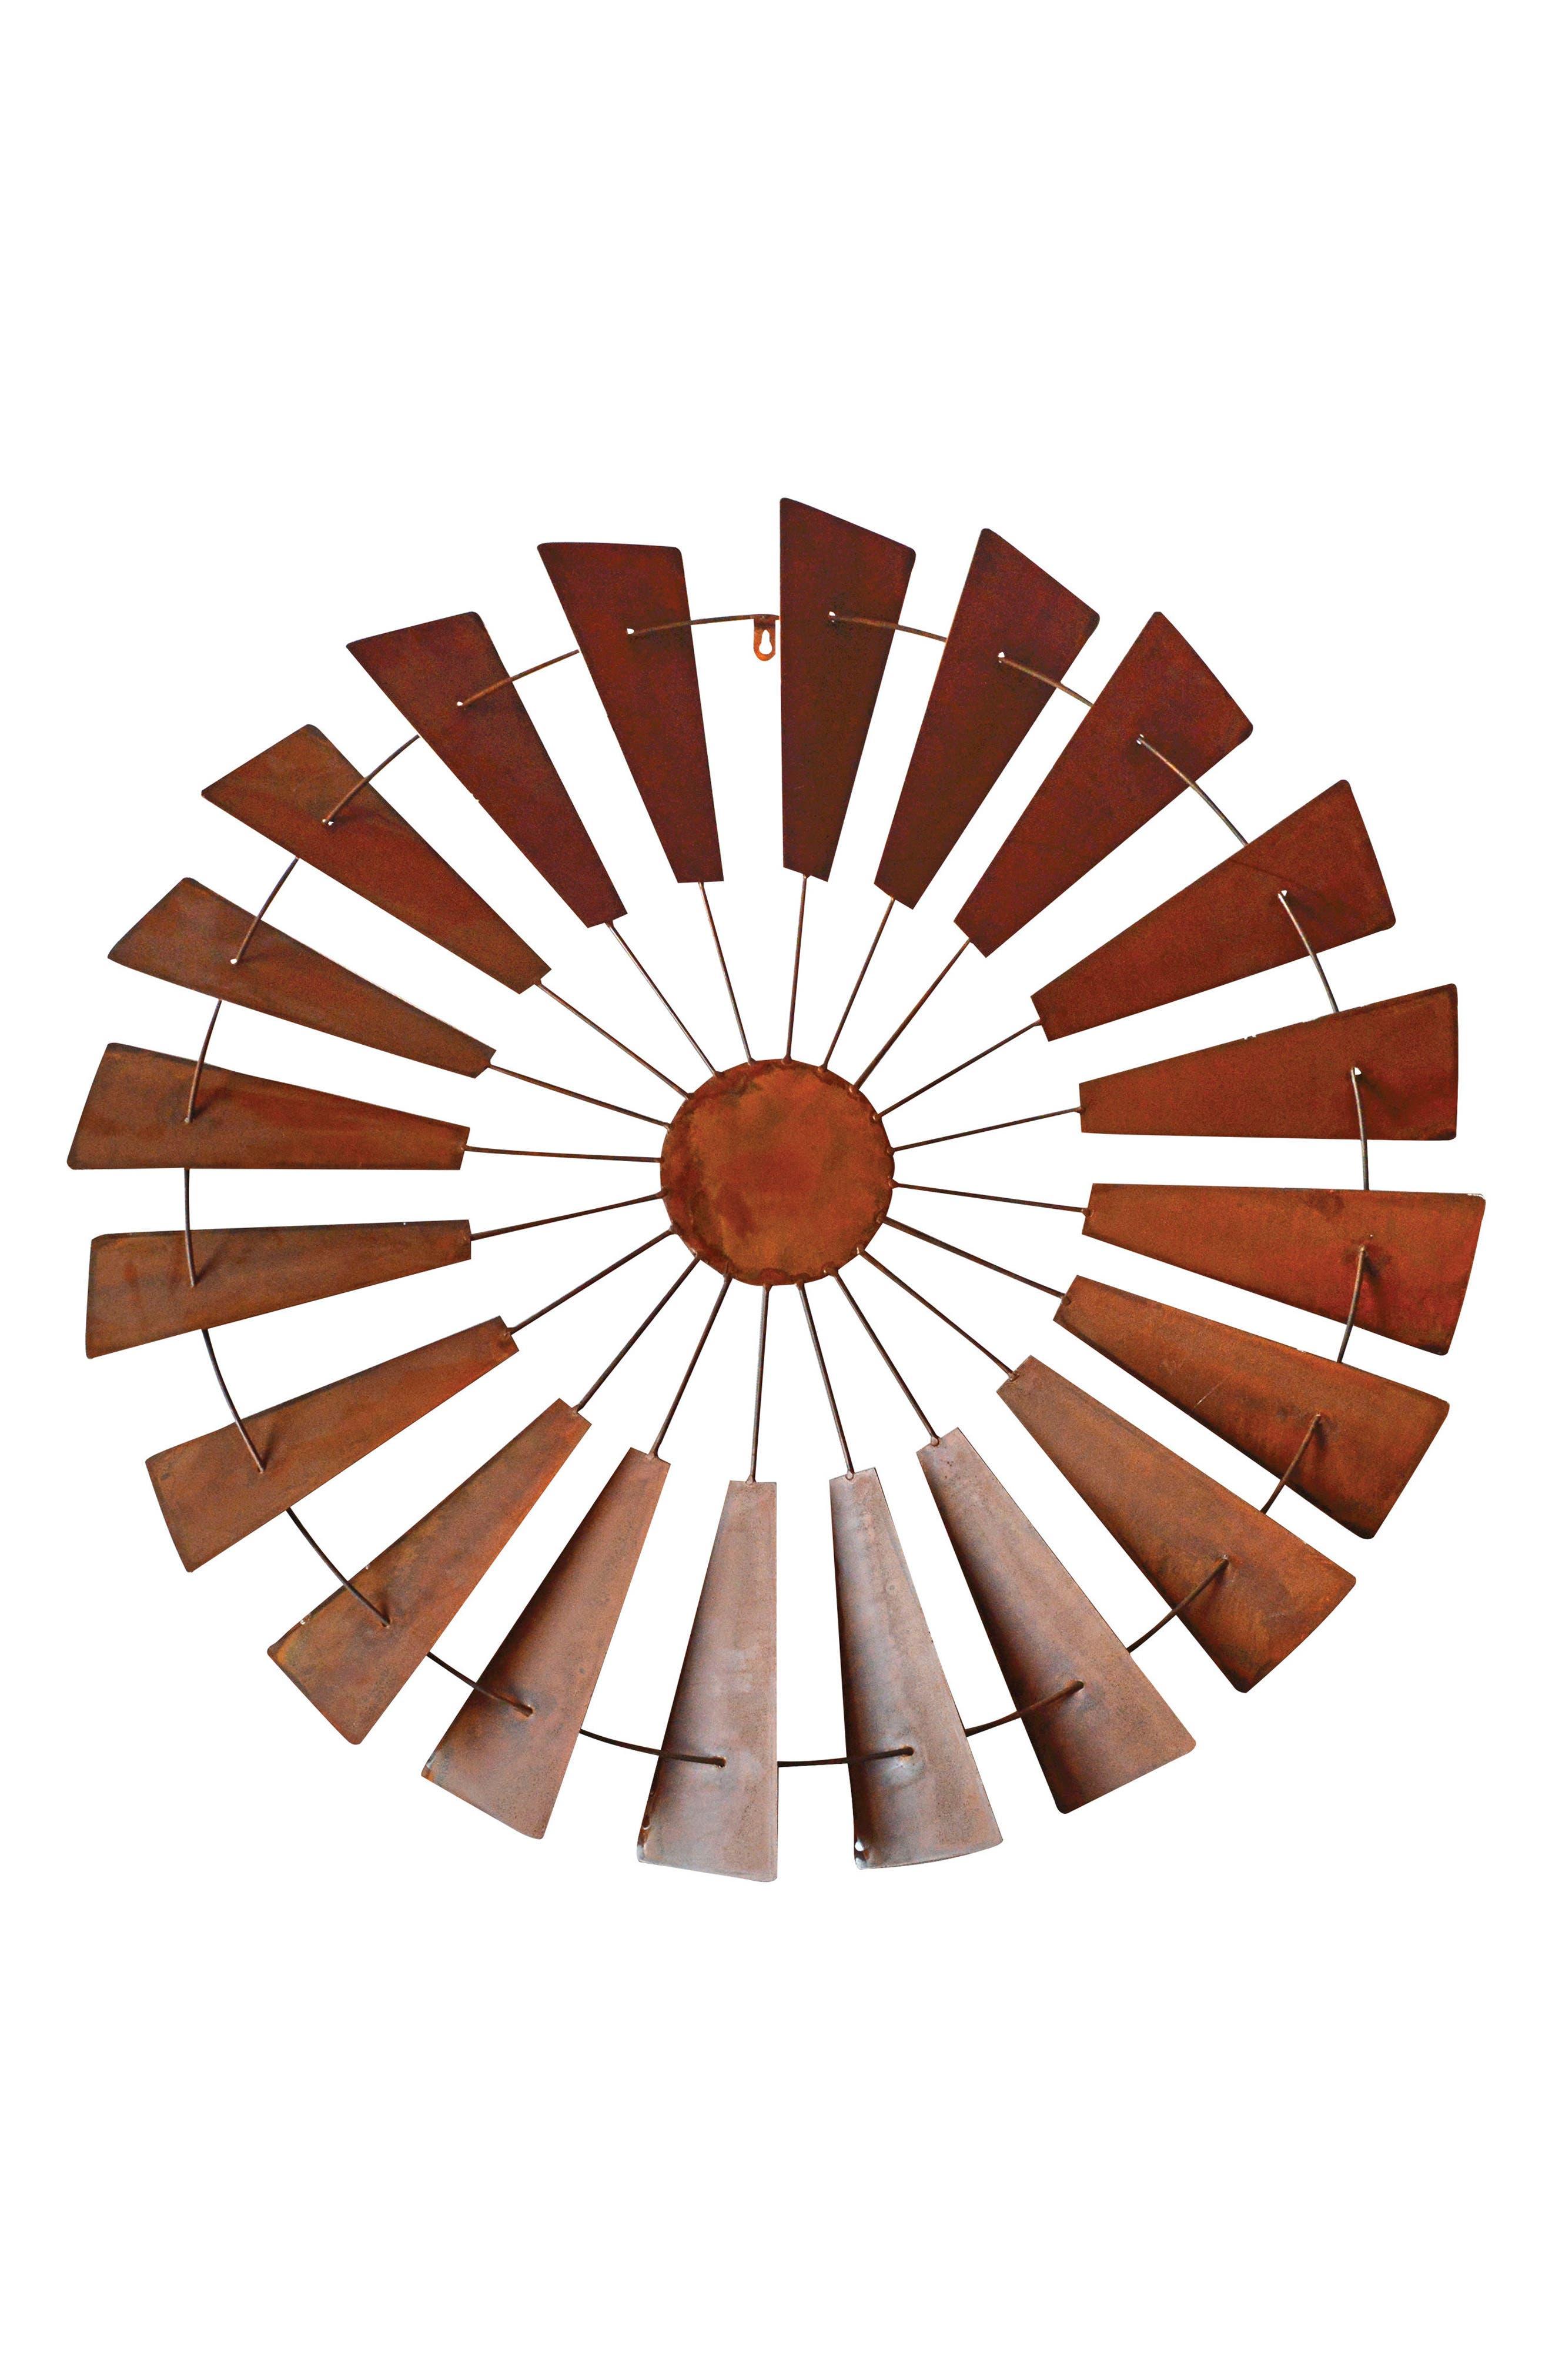 Main Image - Foreside Windmill Wall Art